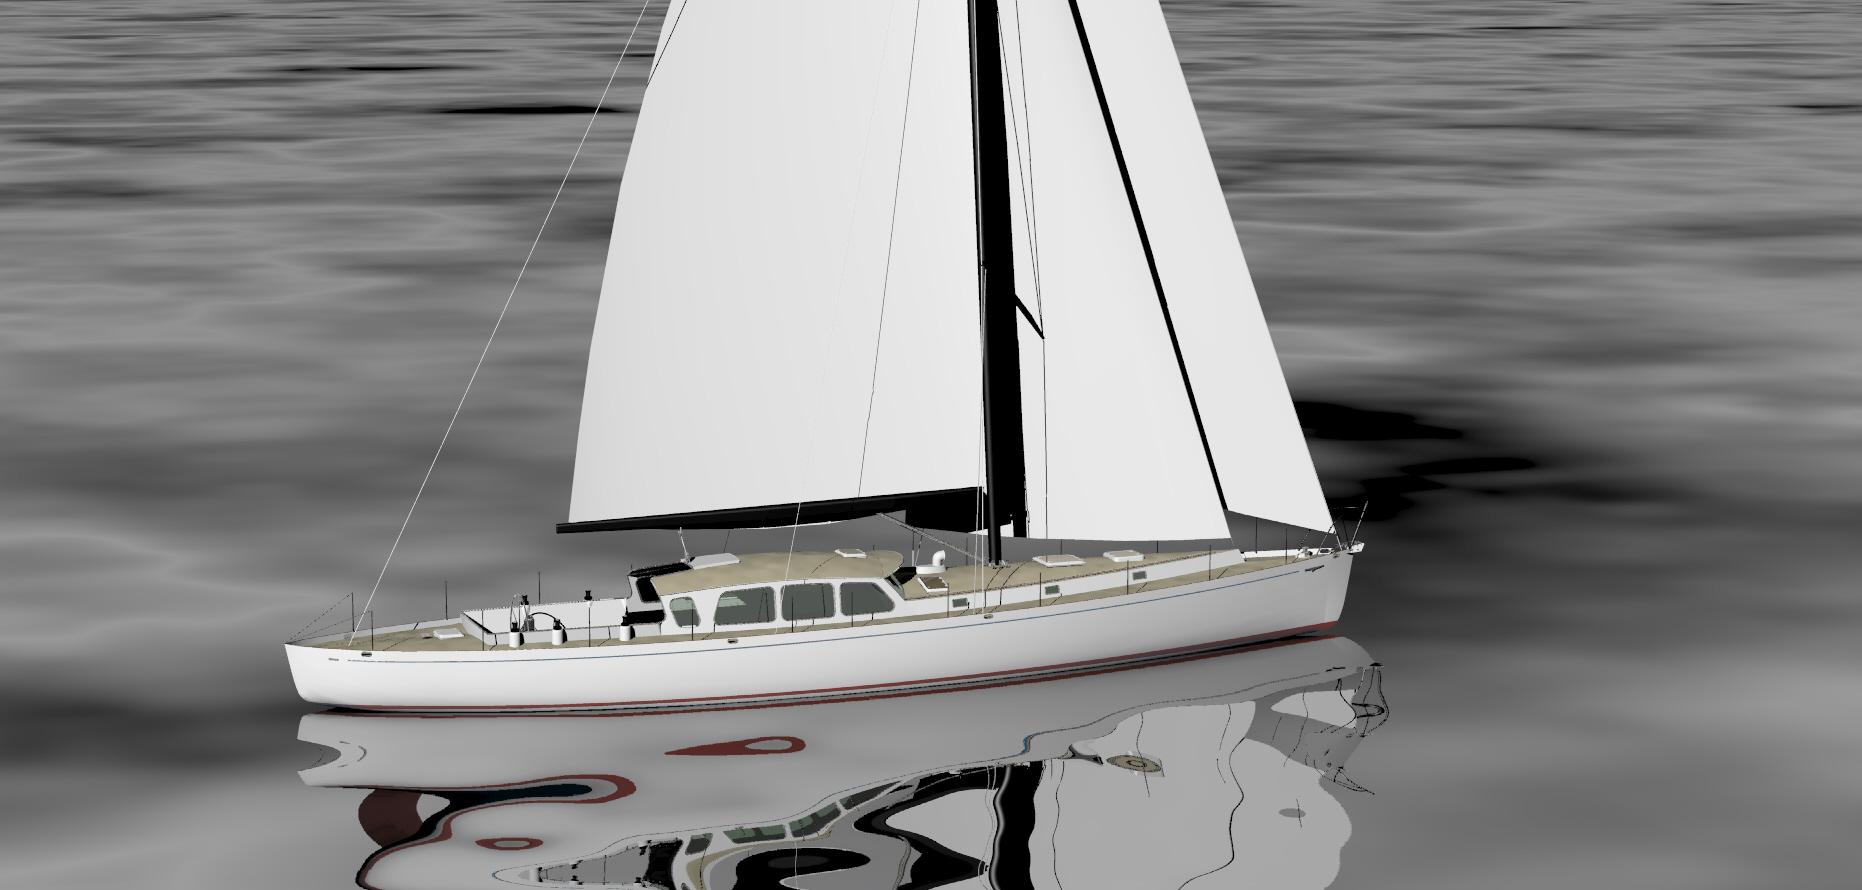 Gardenia boat design net gallery for William garden boat designs